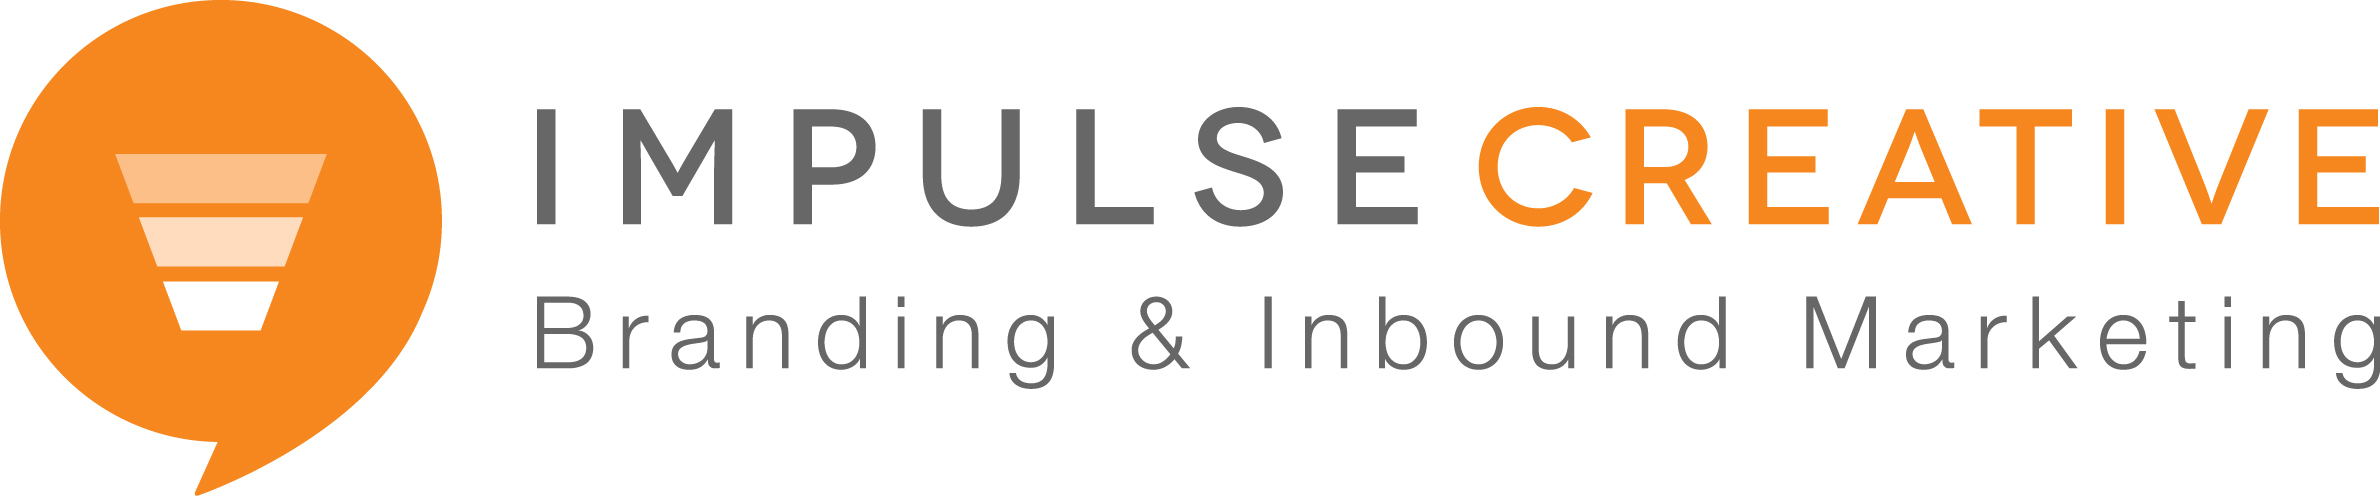 Impulse Creative Team